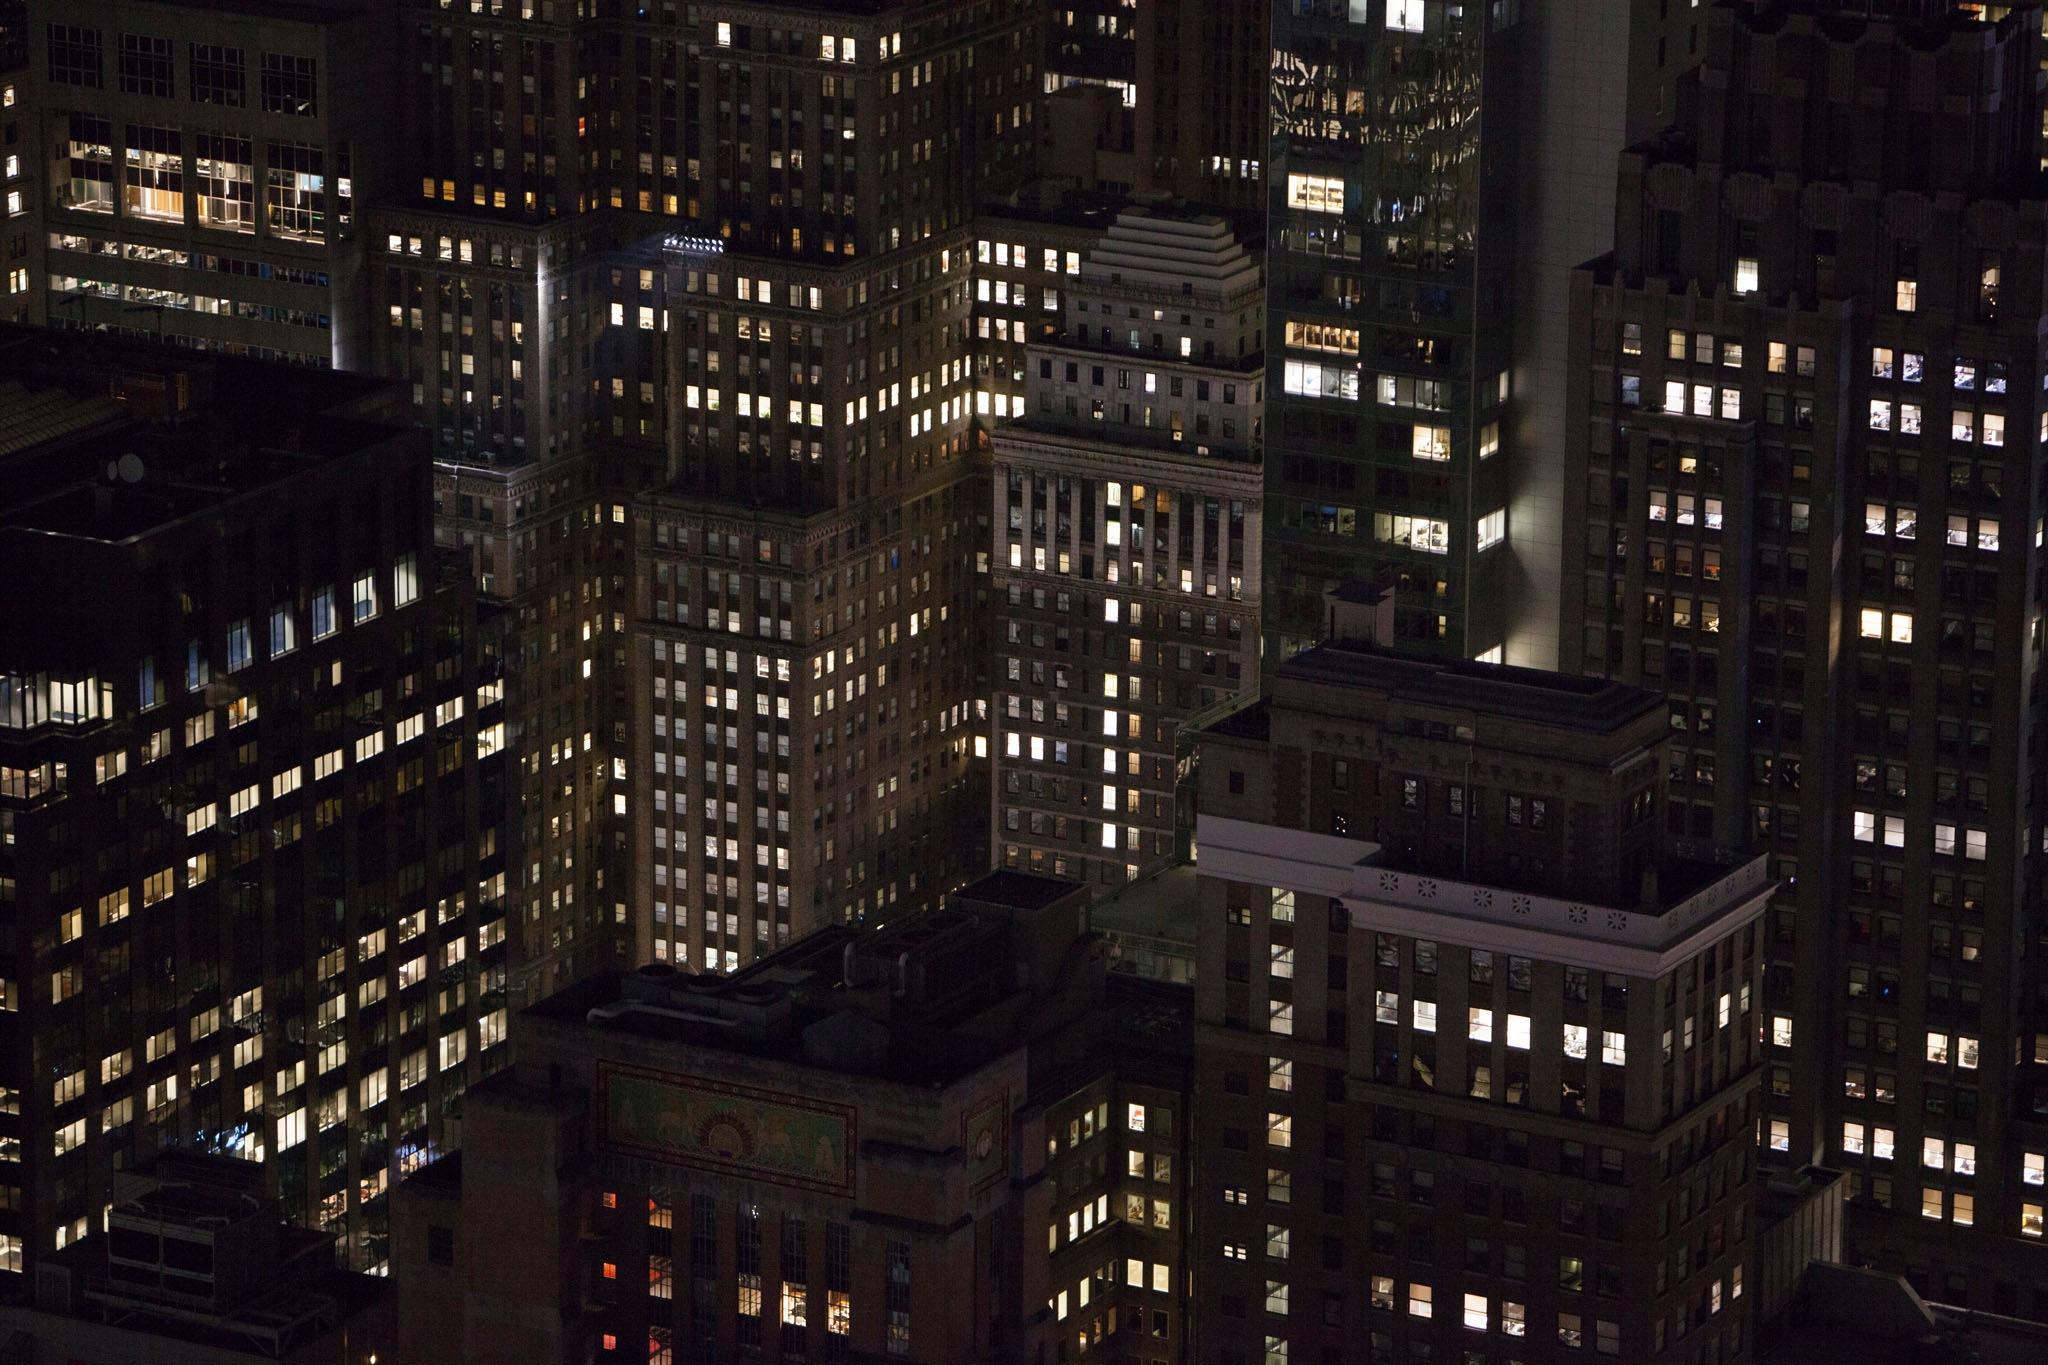 New York by night by Patrick van Gemert